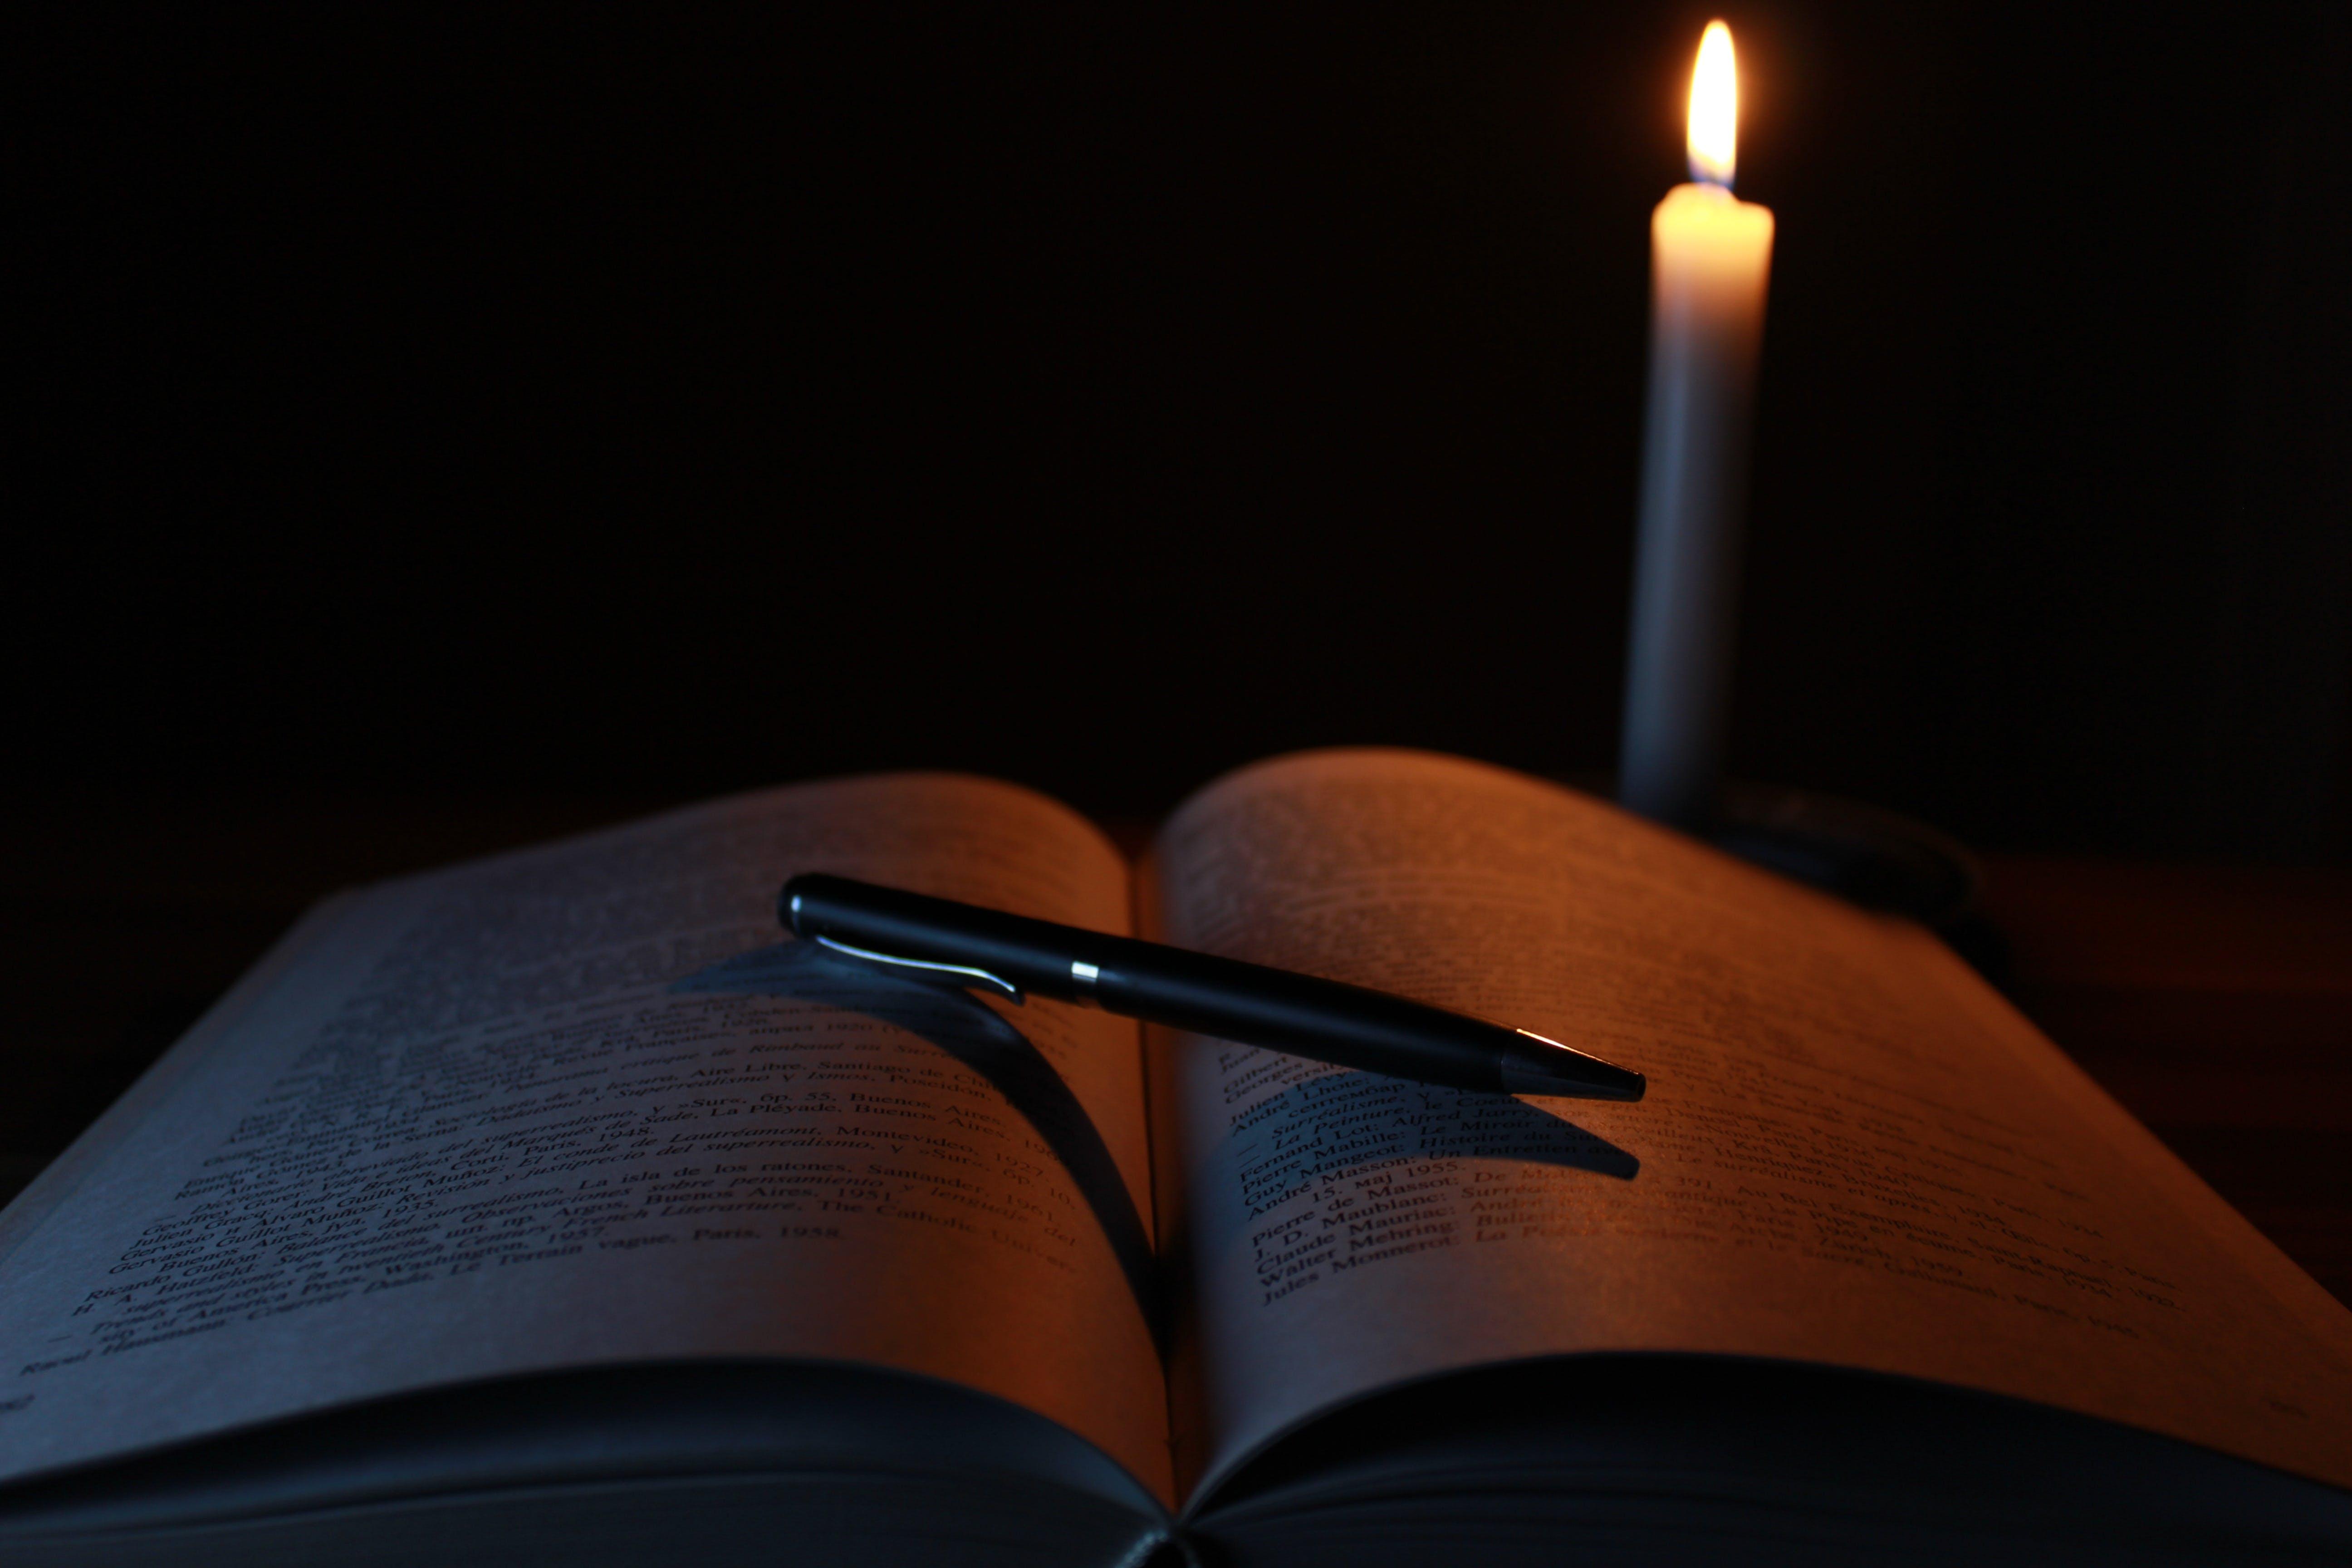 Free stock photo of light, dark, pen, blur